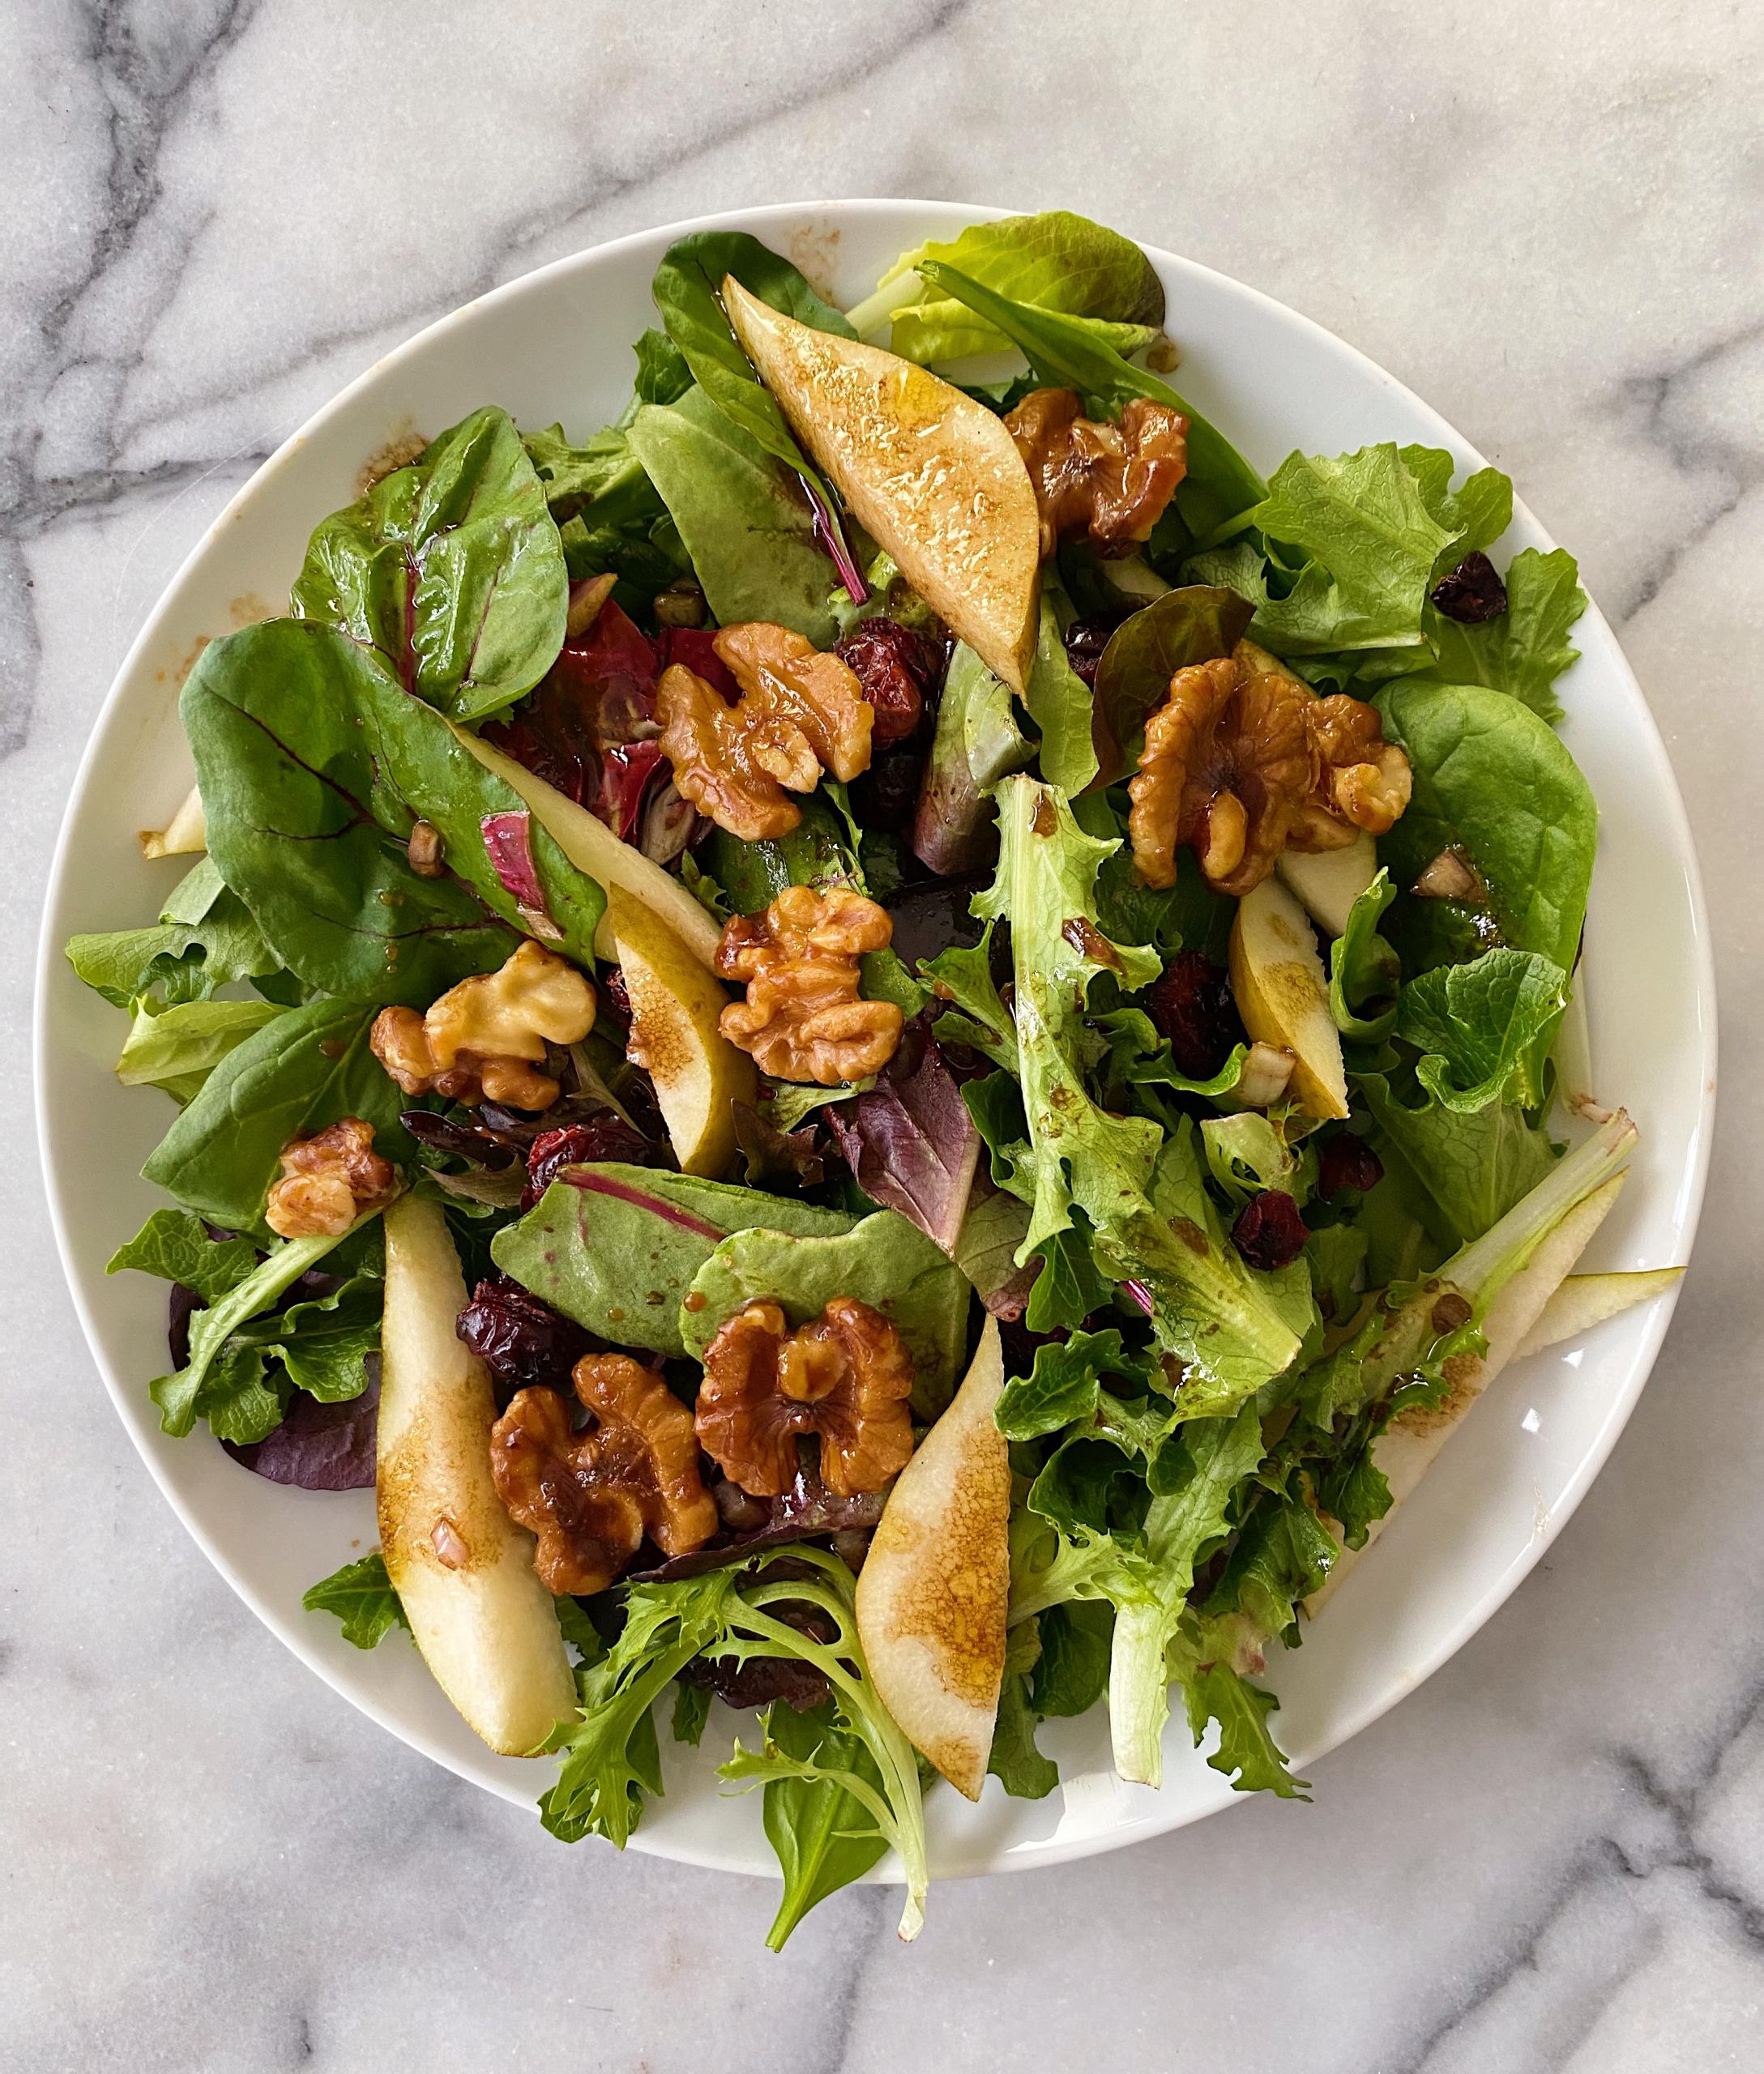 Green Salad healthy candied walnuts pears balsamic #glutenfree #glutenfreerecipes www.healthygffamily.com